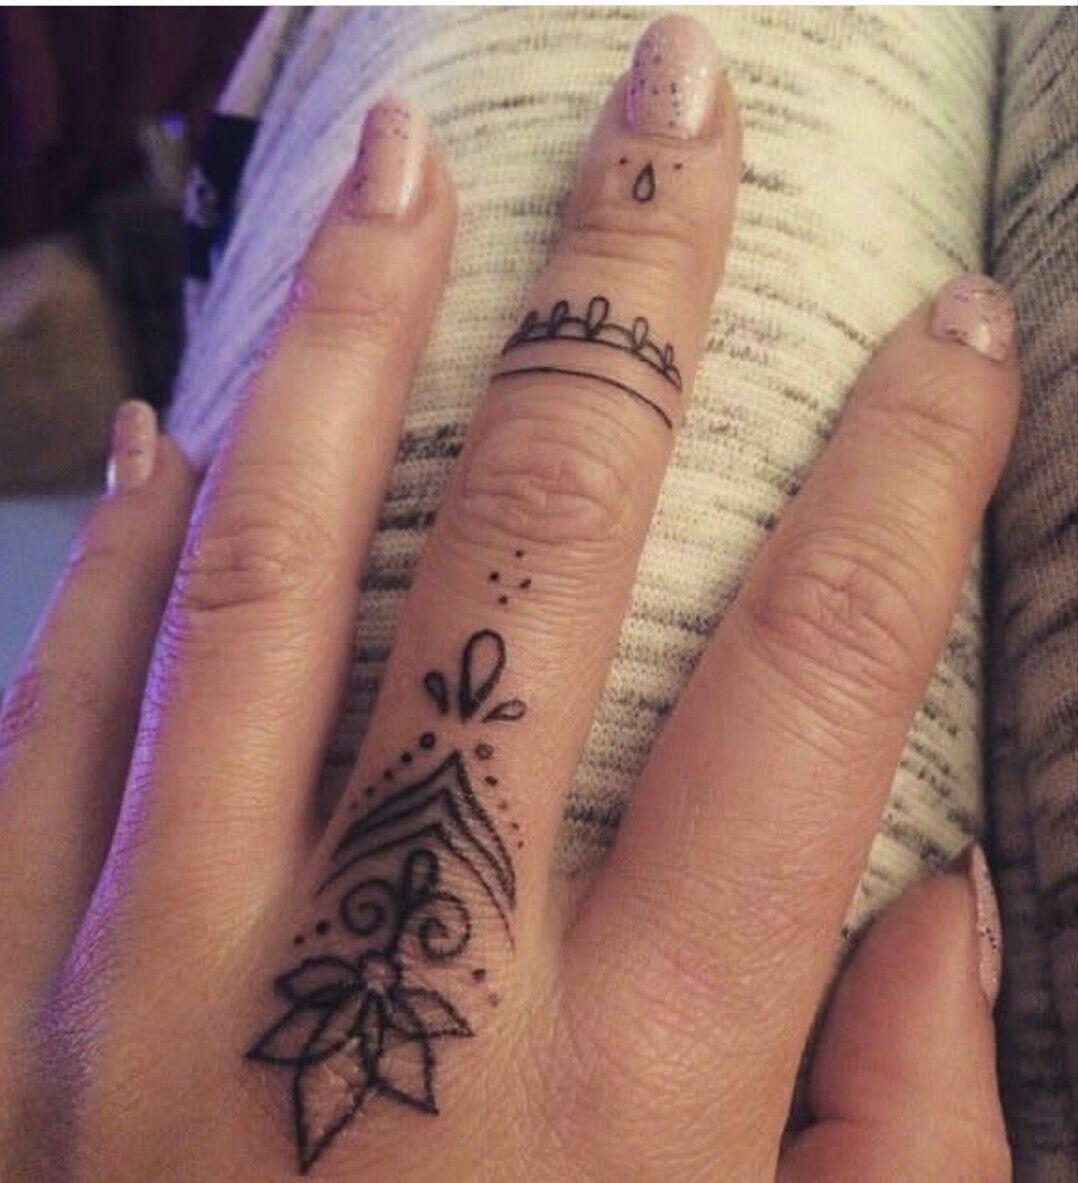 Melain Afro Tatto Ideas Finger Tattoo Designs Finger Tattoos Hand Tattoos